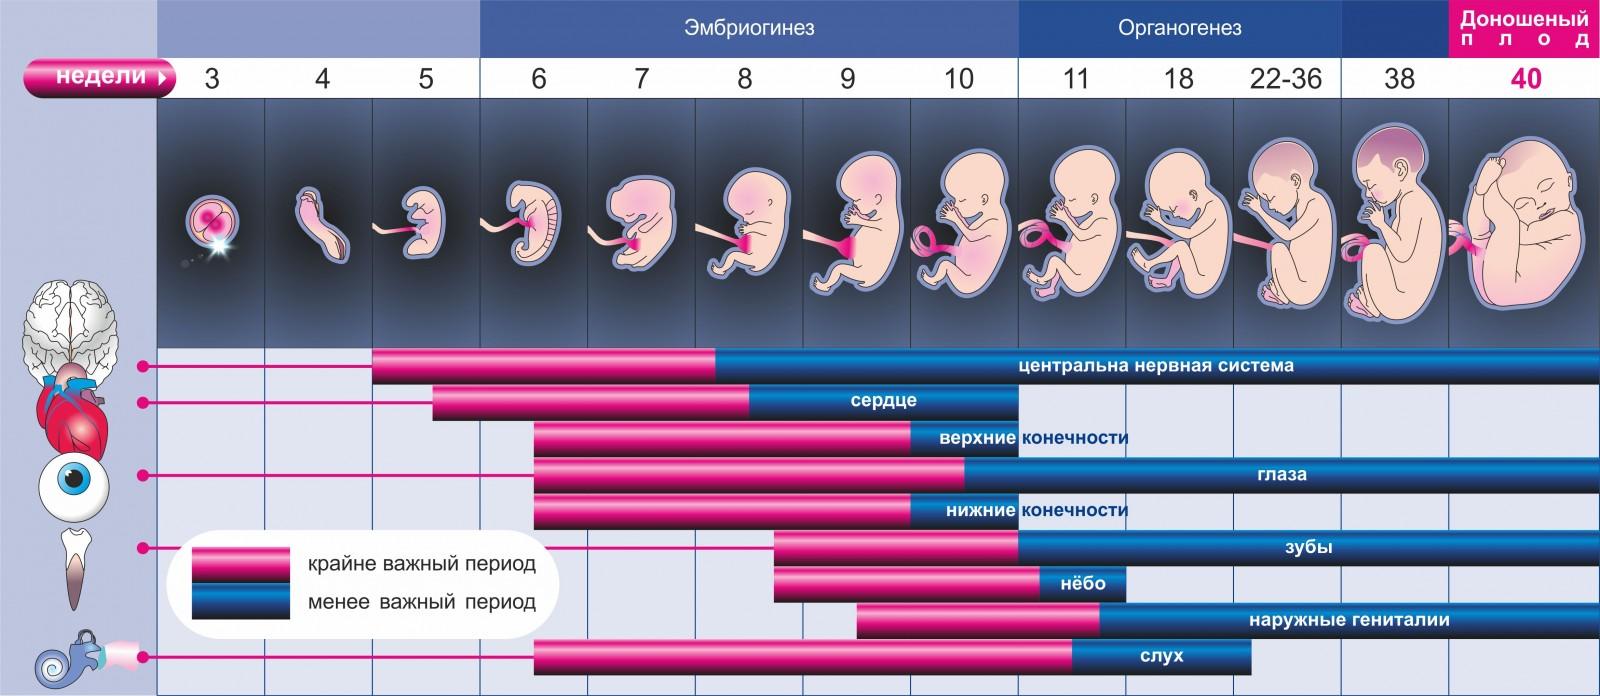 Bagaimana Untuk Mengira Usia Kehamilan Dengan Tarikh Konsepsi Pengiraan Bagaimana Untuk Menentukan Dan Mengetahui Istilah Pada Hari Dari Konsepsi Bagaimana Untuk Mengira